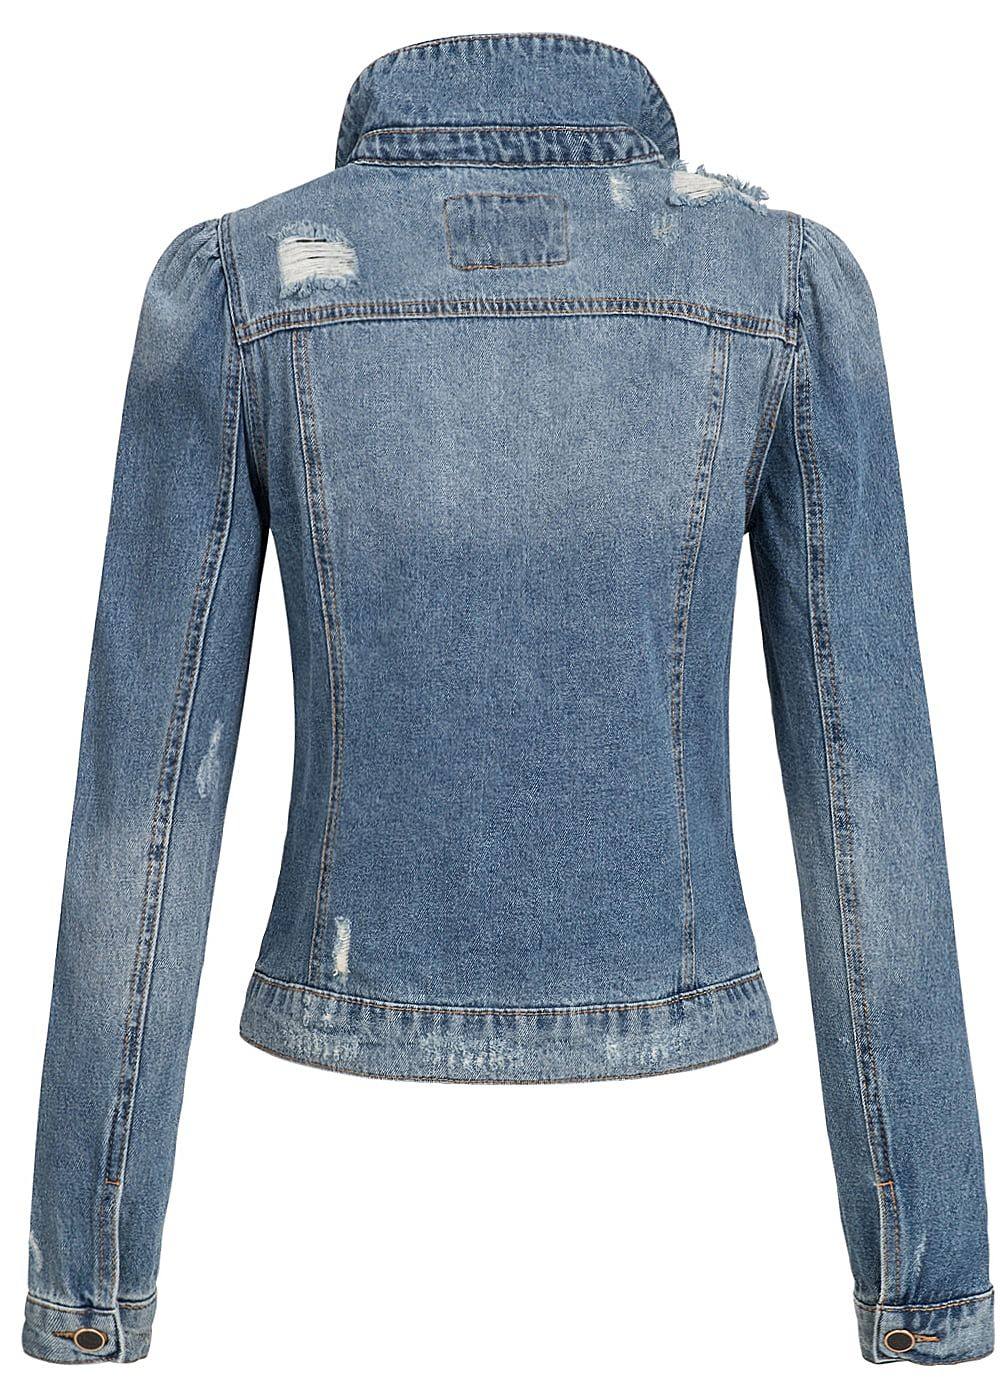 only damen jeans jacke destroy look 2 brusttaschen medium blau denim 77onlineshop. Black Bedroom Furniture Sets. Home Design Ideas